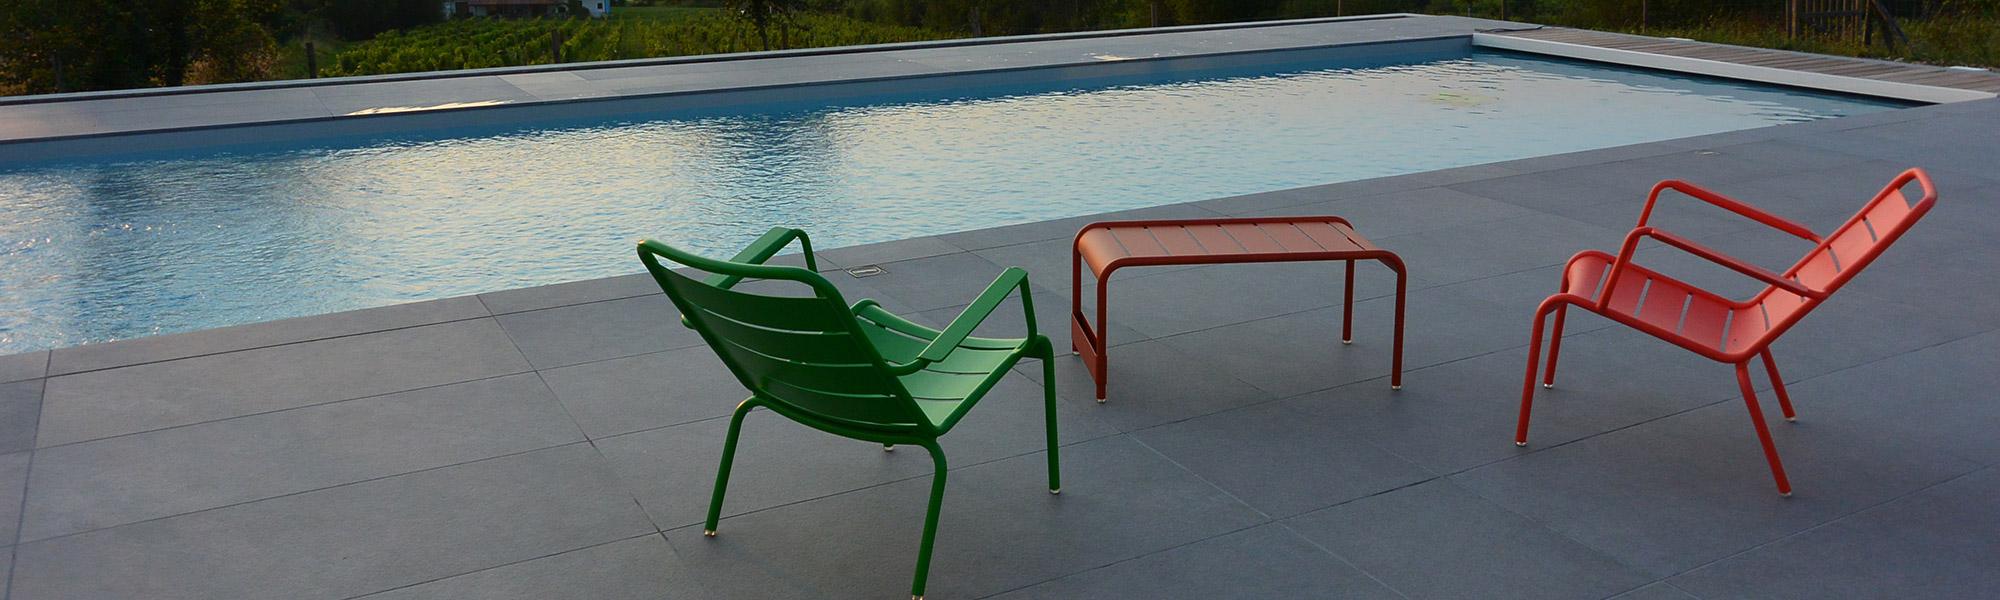 Demander un devis piscine coque bordeaux for Devis piscine coque